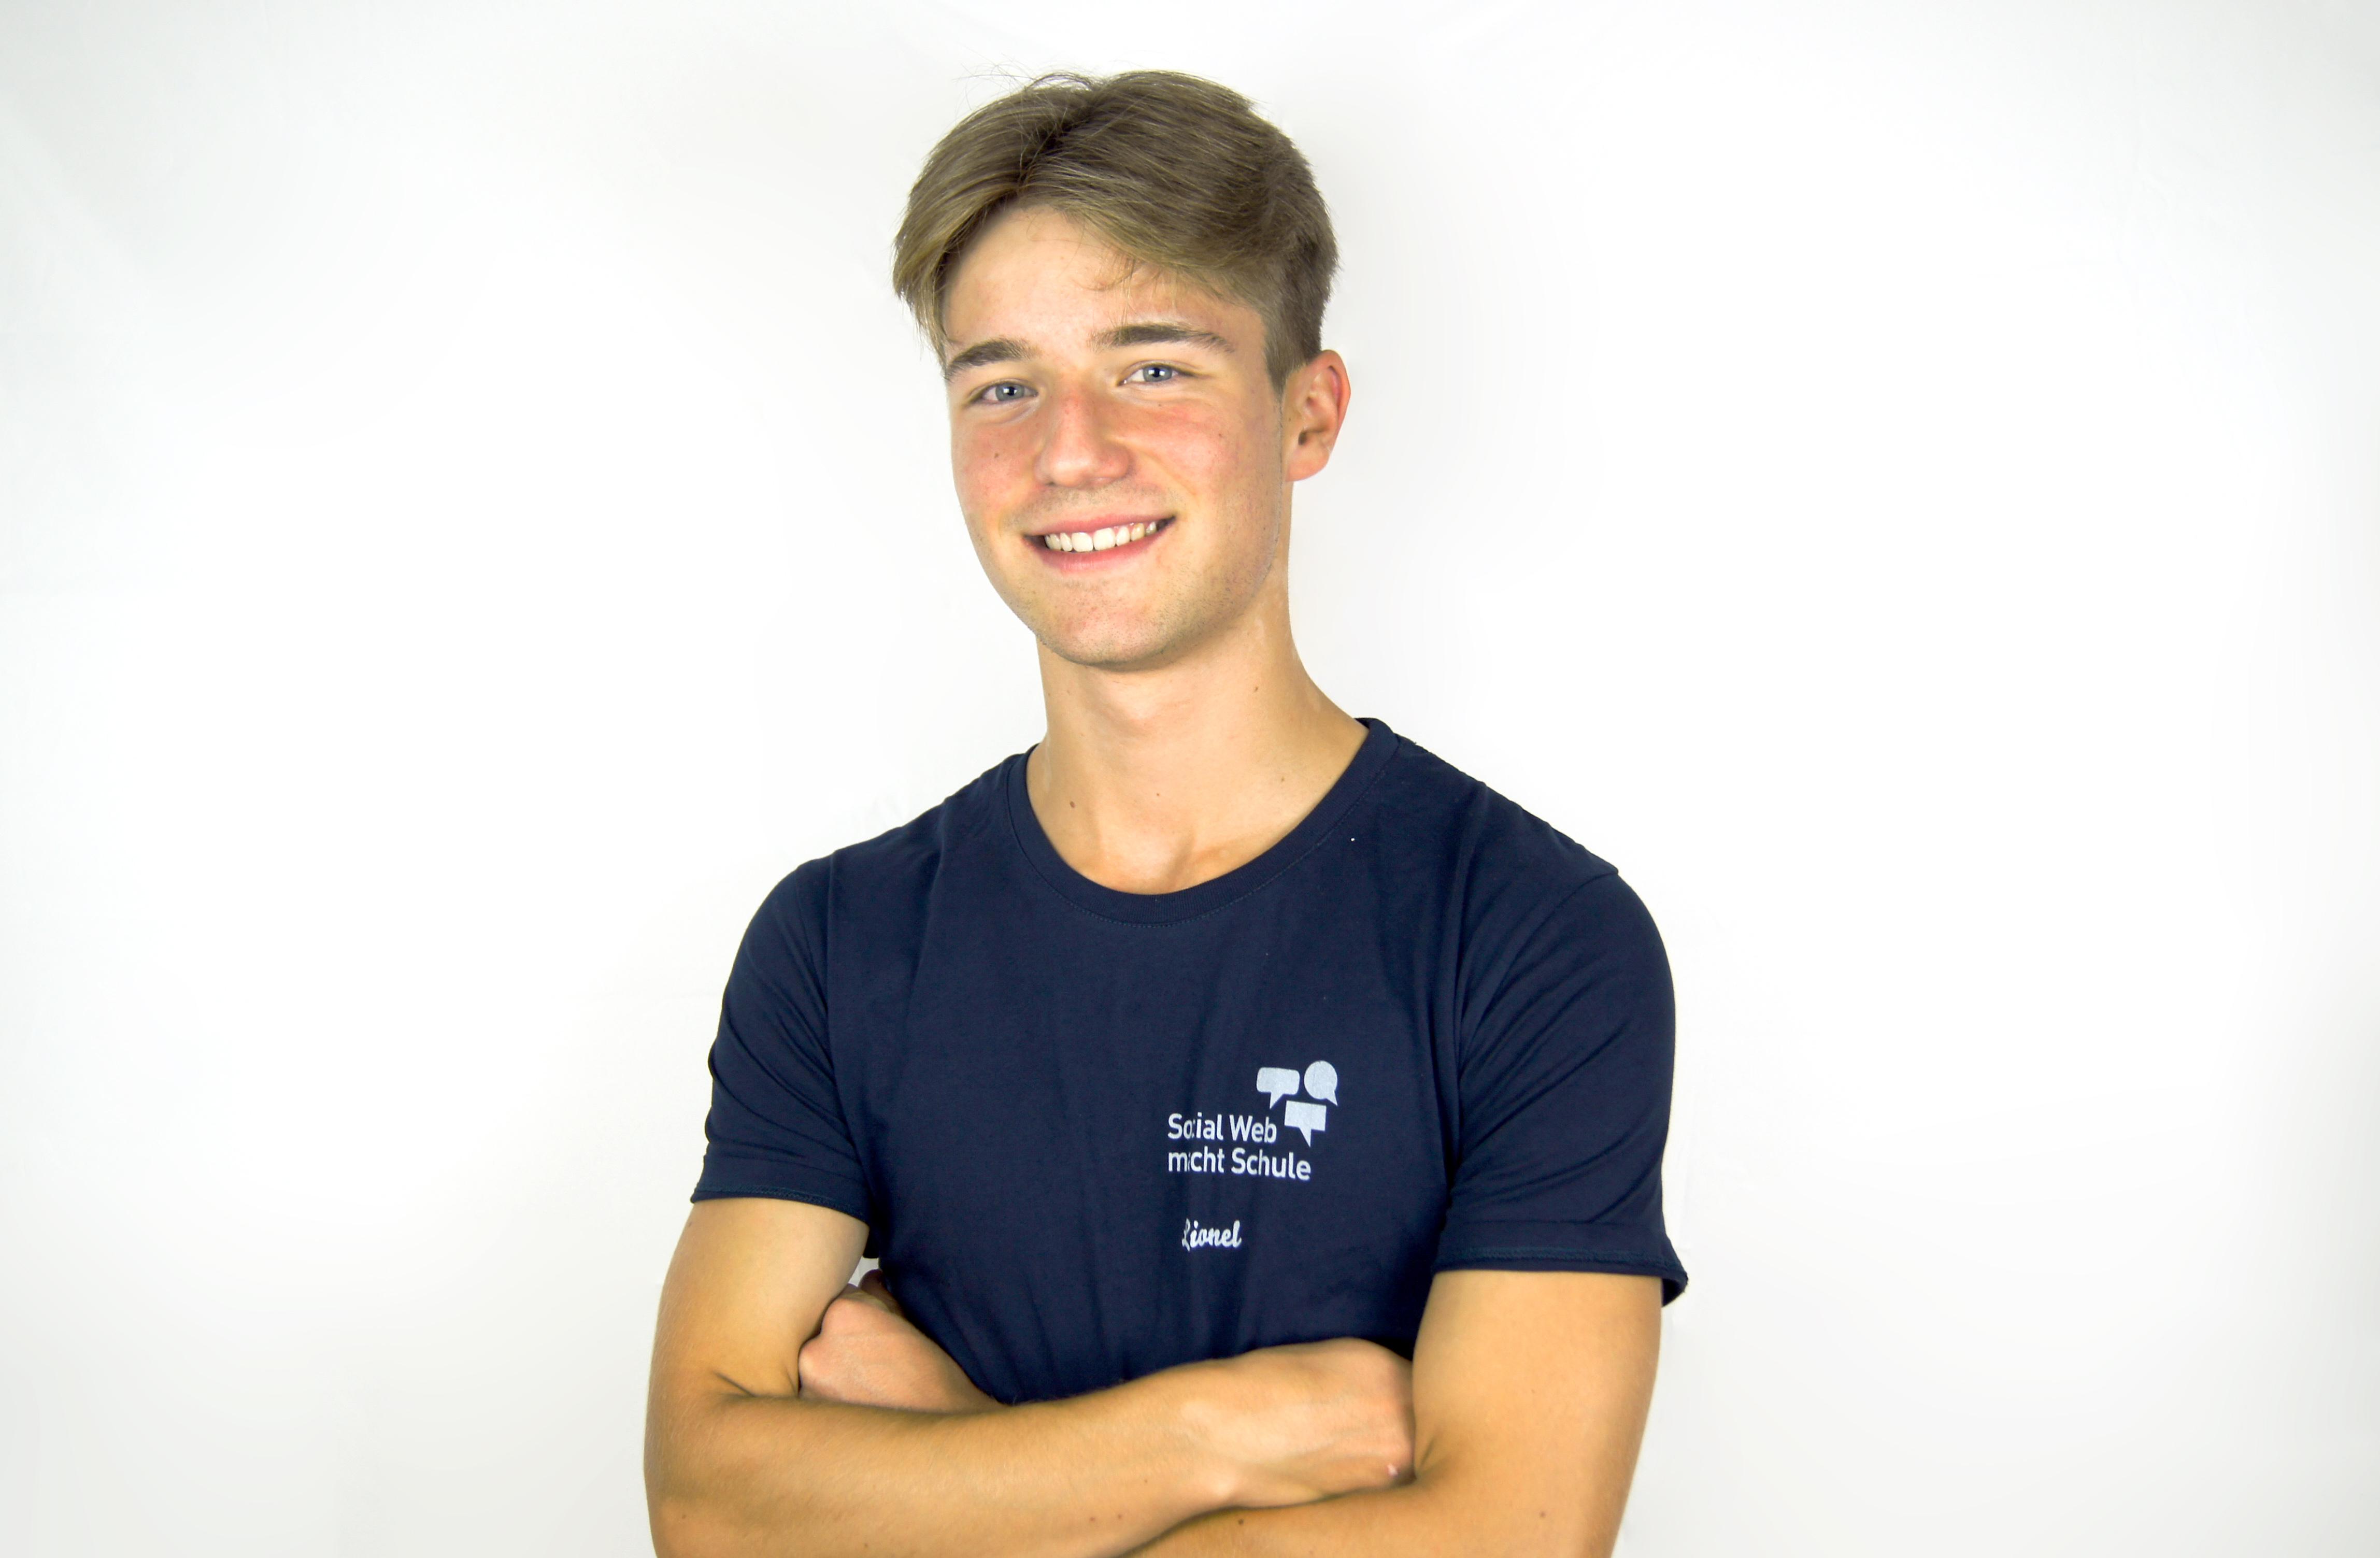 Lionel Otto Bundesfreiwilliger Social Web macht Schule